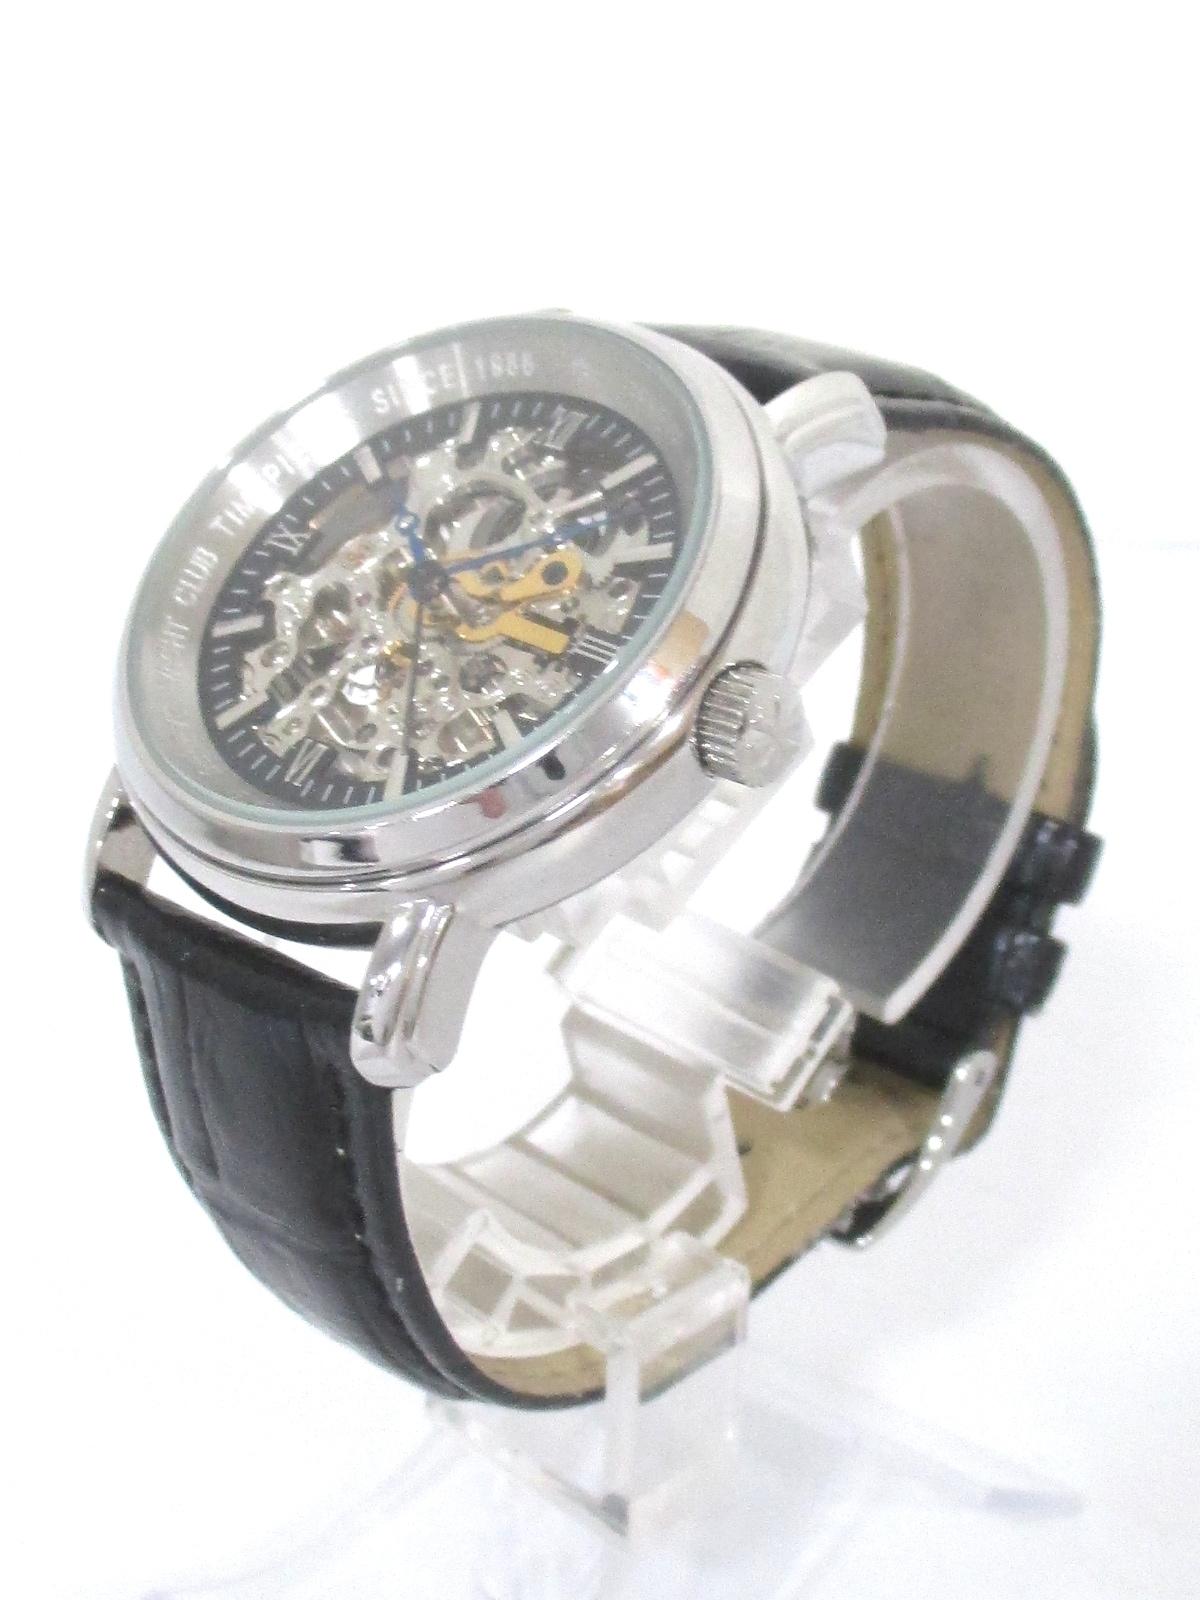 GENEVE YACHT CLUB(ジュネーブヨットクラブ)の腕時計